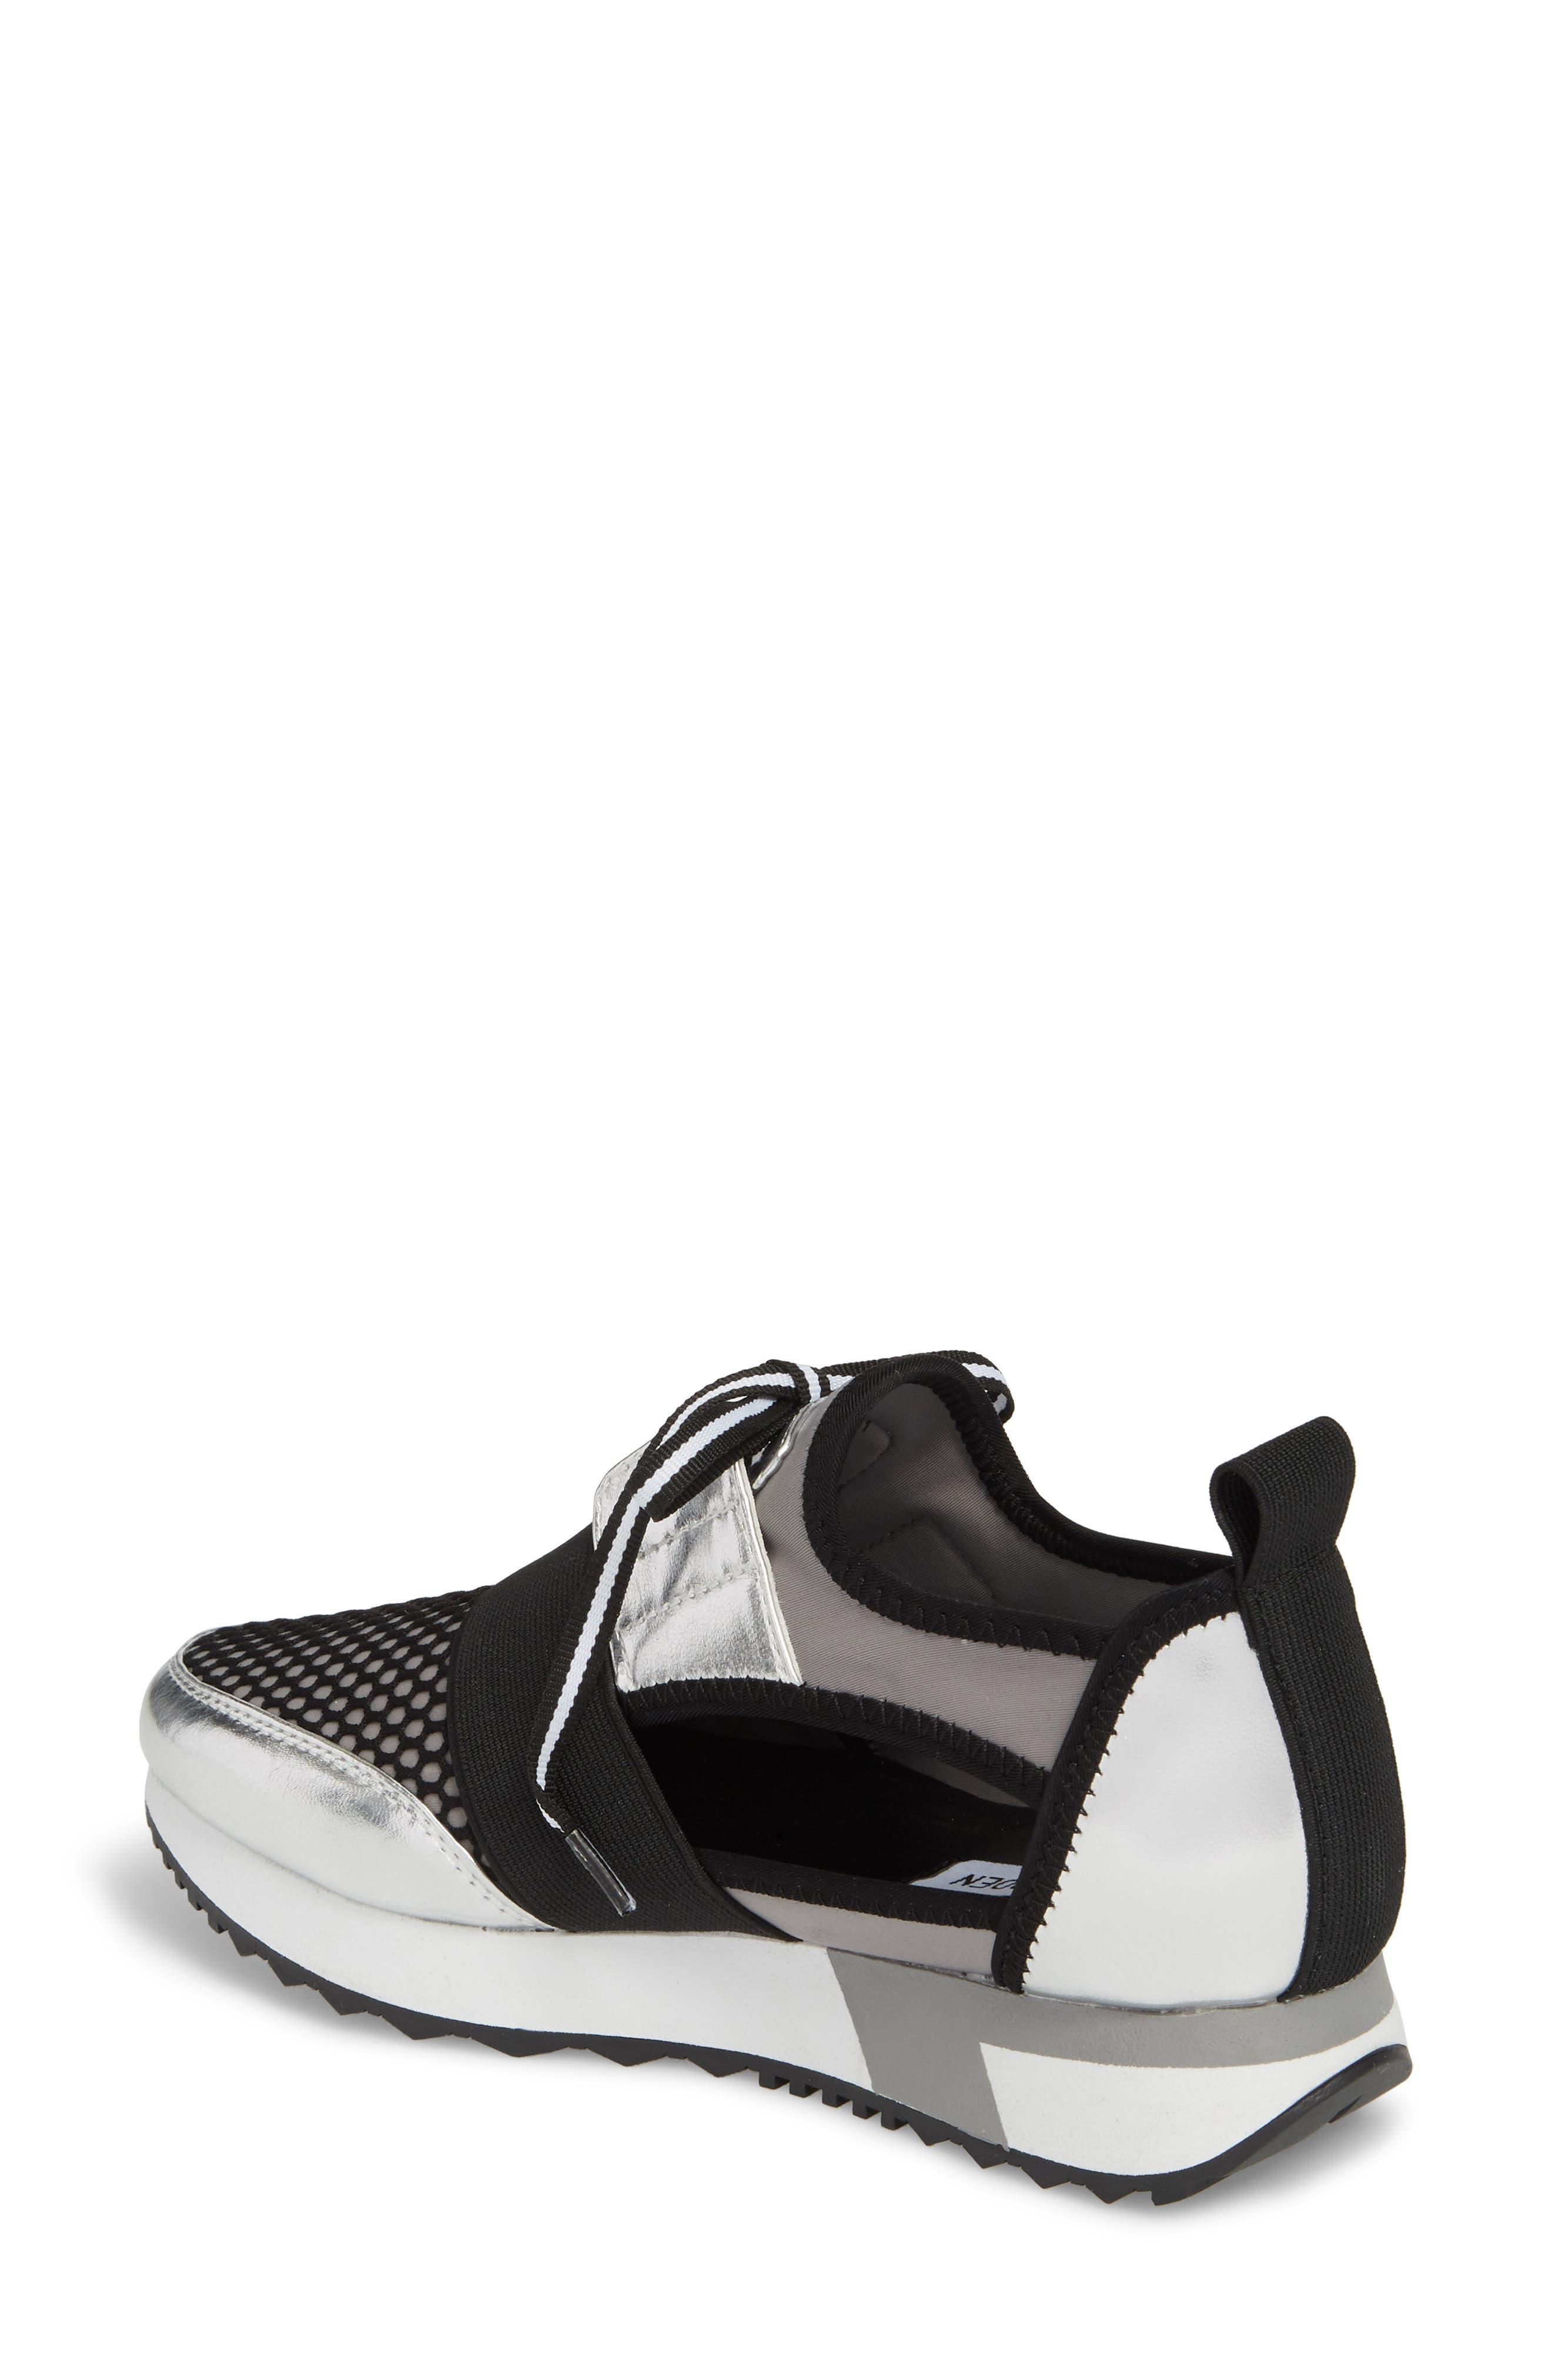 Arctic Sneaker,                             Alternate thumbnail 2, color,                             SILVER MULTI